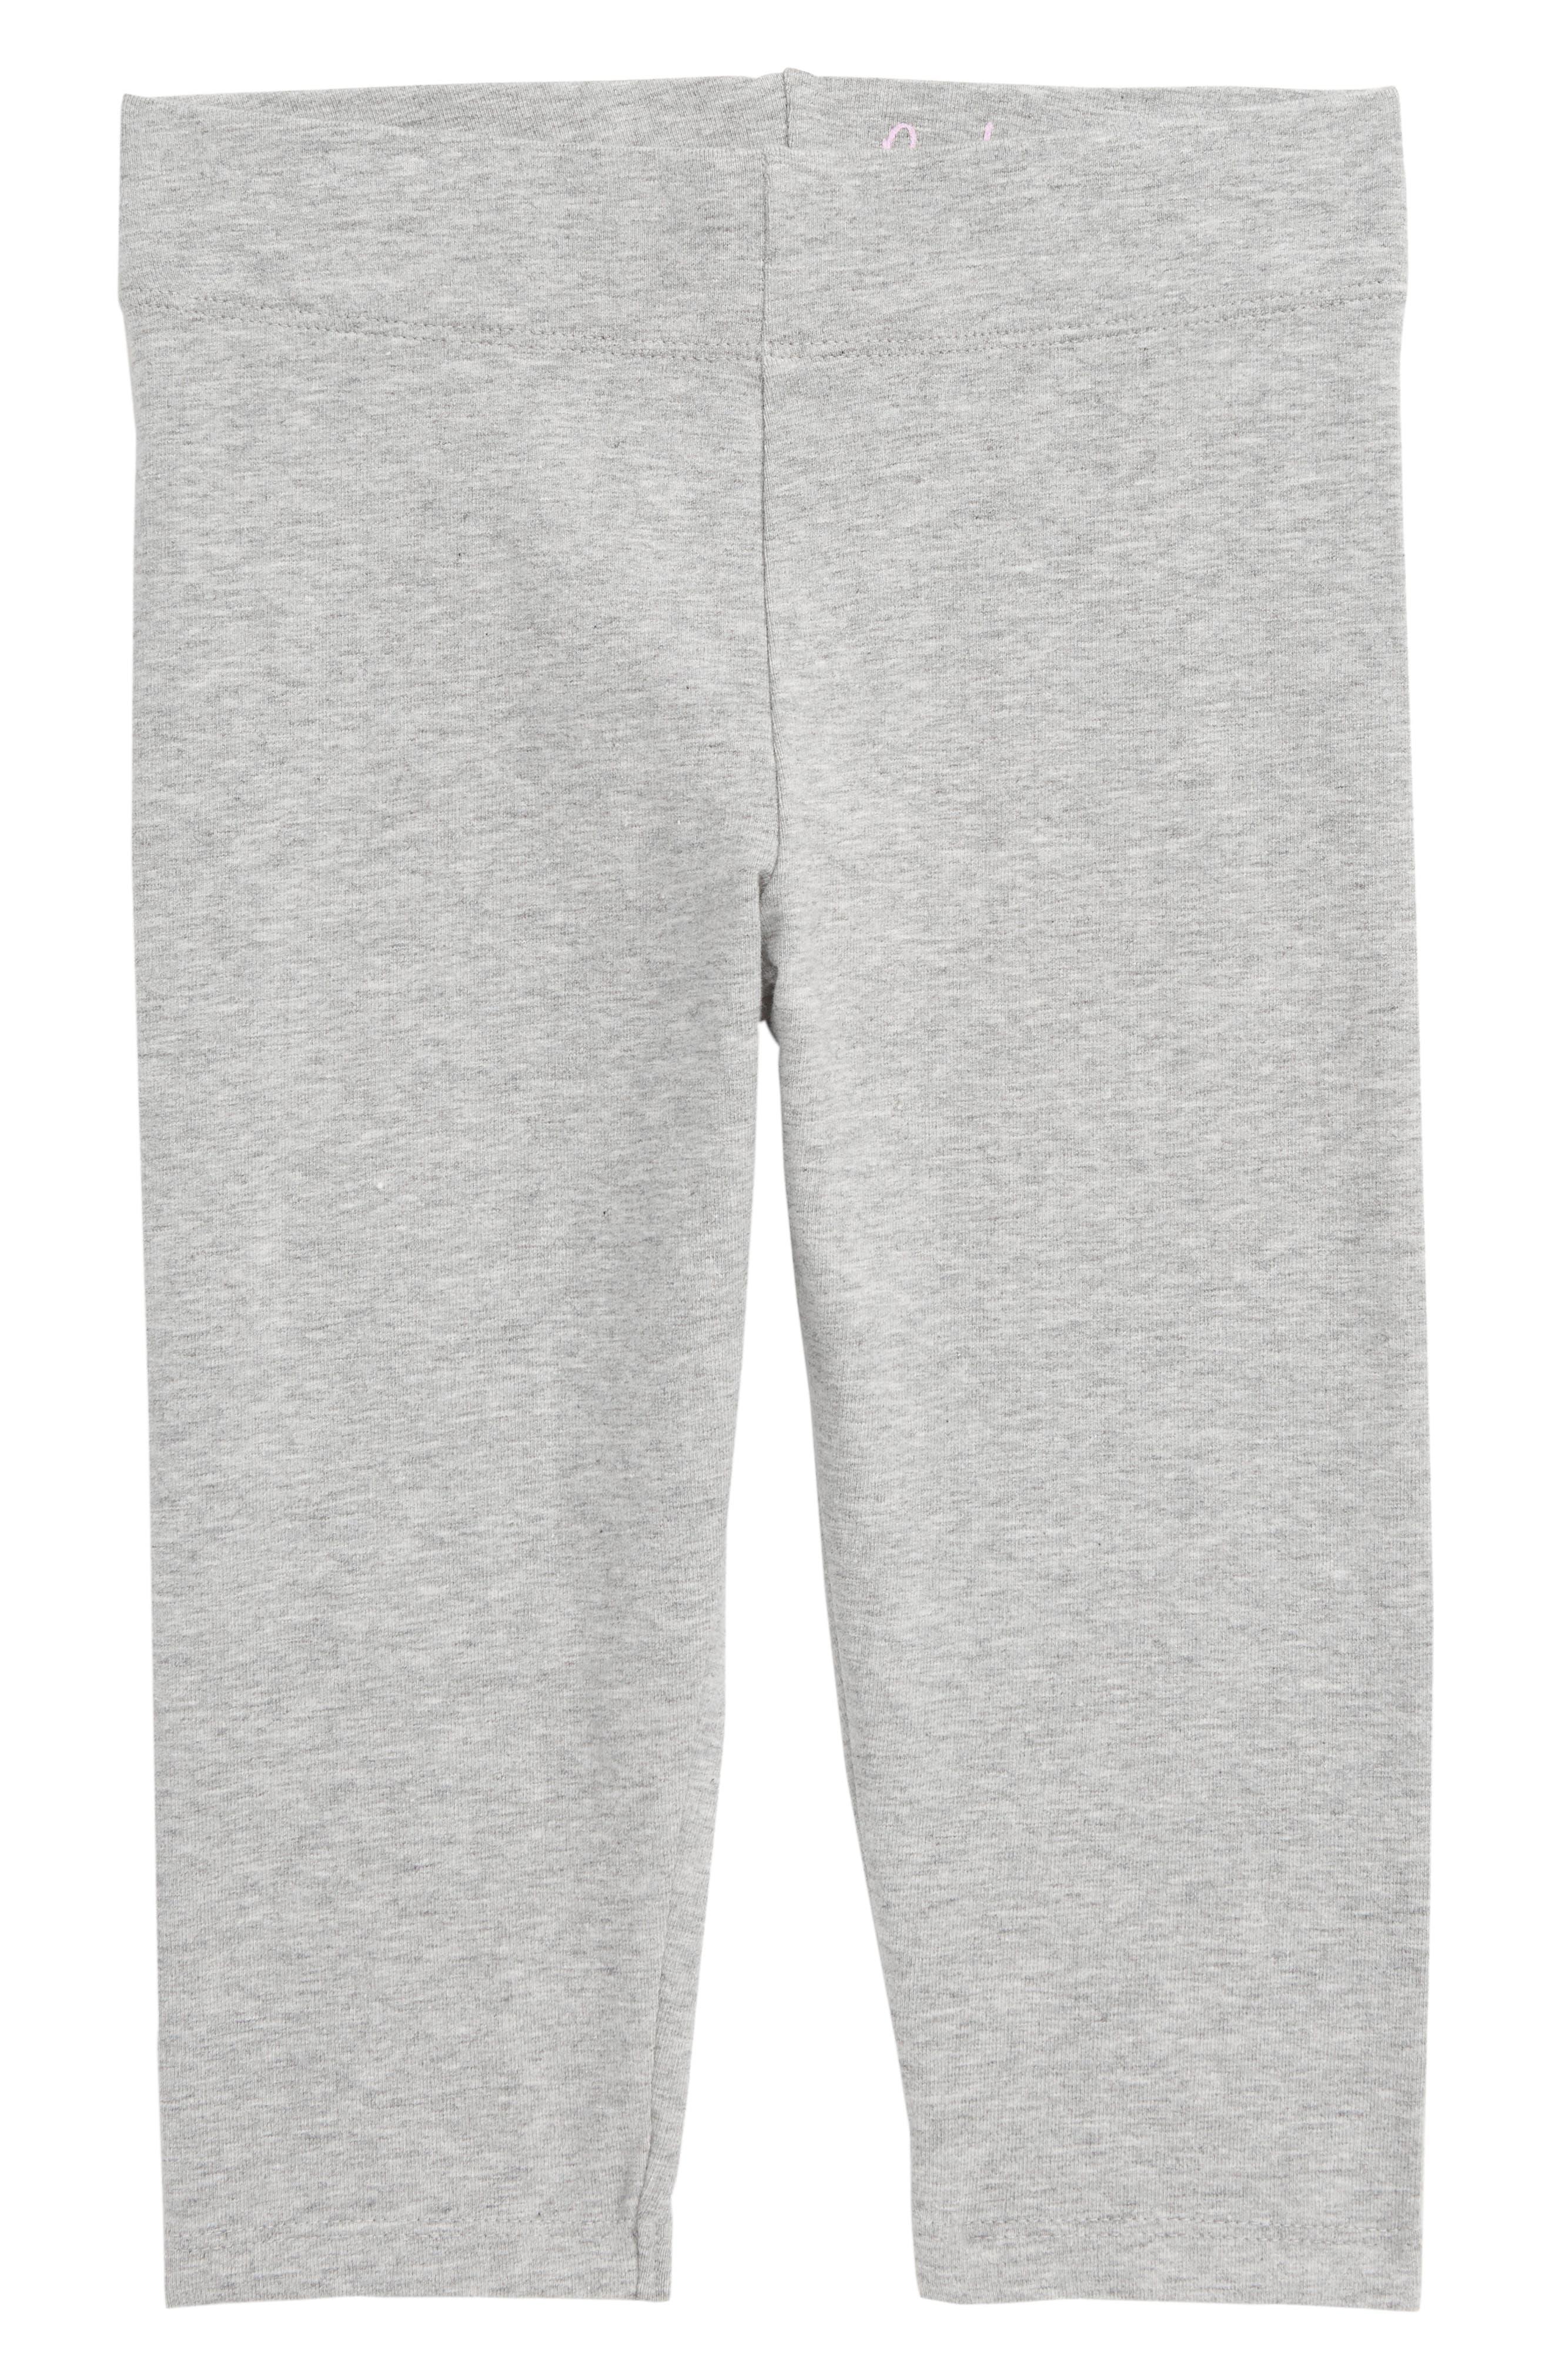 Girls Boden Plain Crop Leggings Size 910Y  Grey